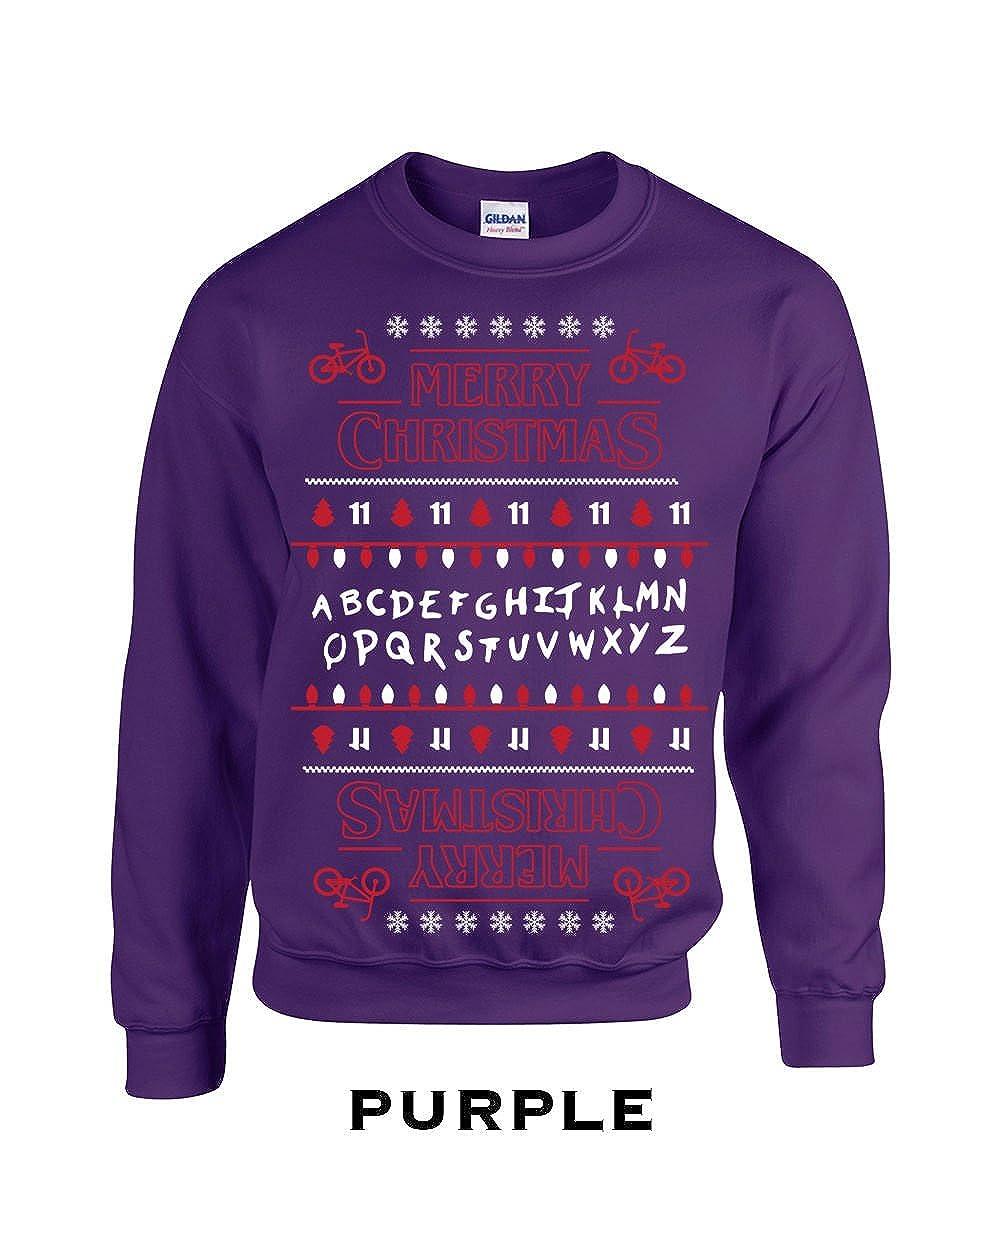 Swaffy Tees 640 Merry Christmas Upside Down Funny Adult Crew Sweatshirt